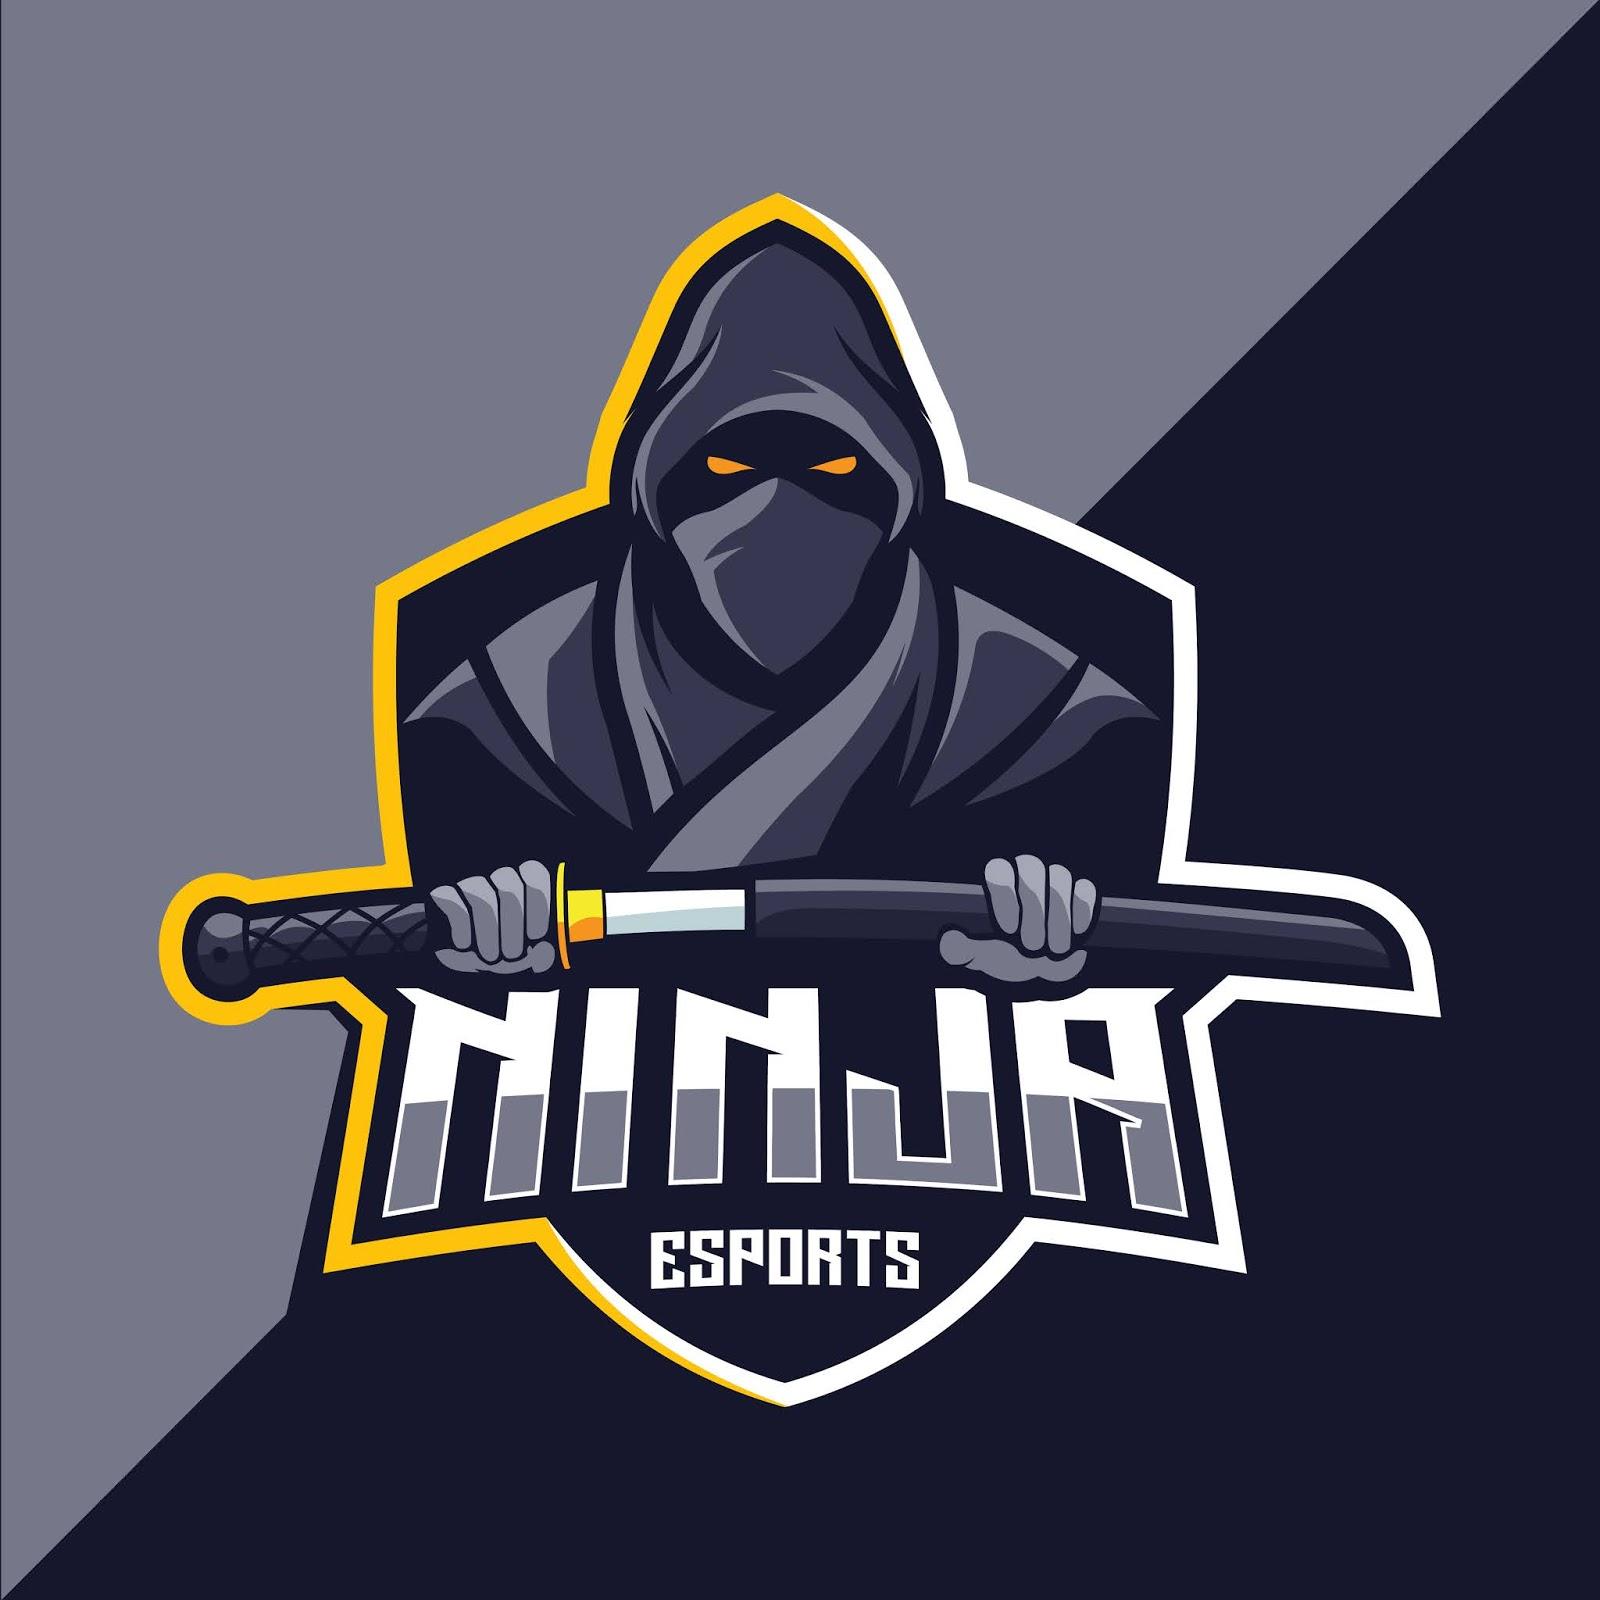 Ninja Mascot Esport Logo Design Free Download Vector CDR, AI, EPS and PNG Formats